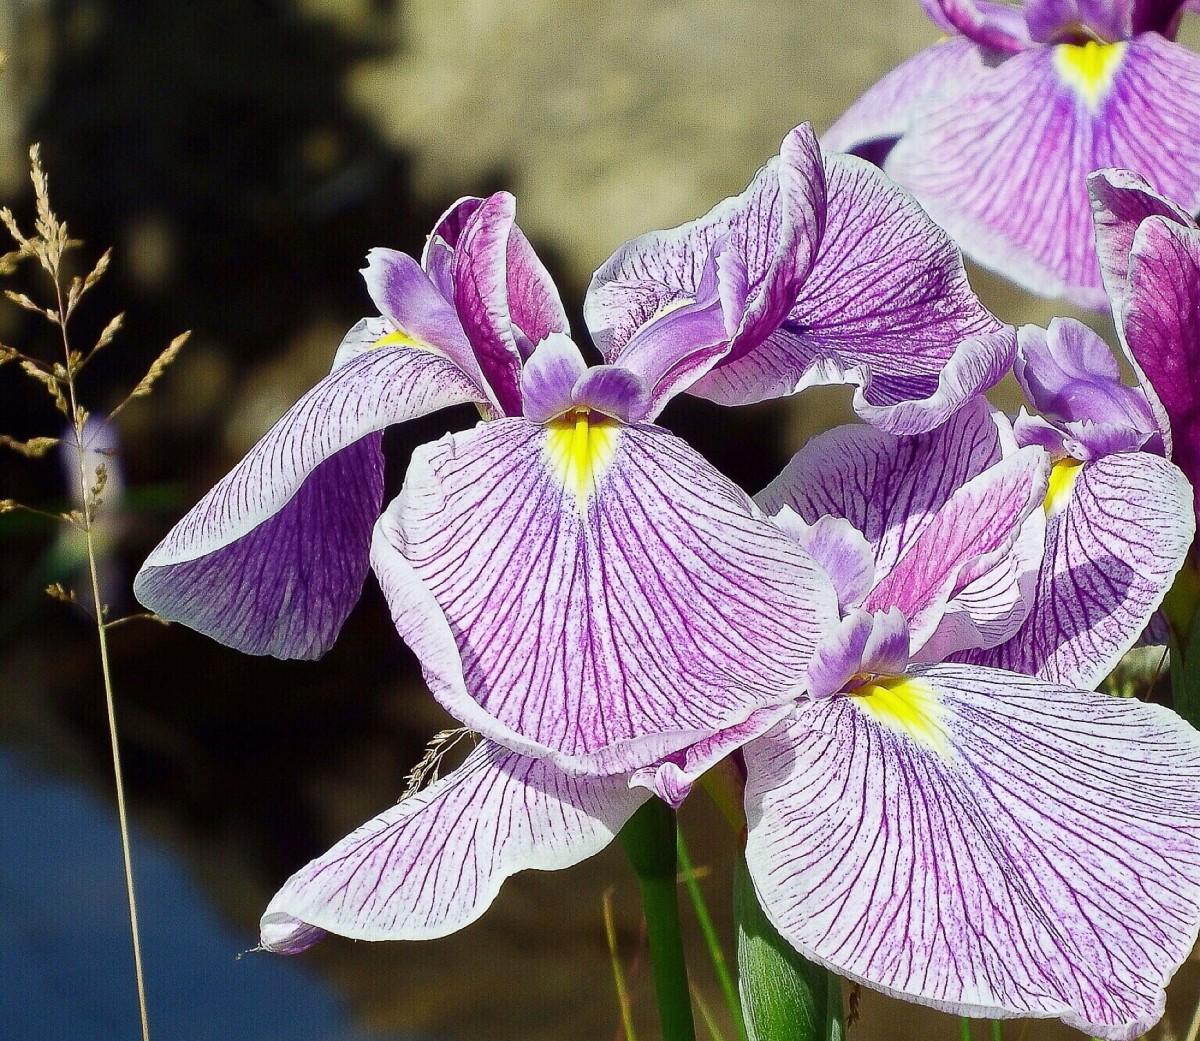 Irises growing in a botanical garden